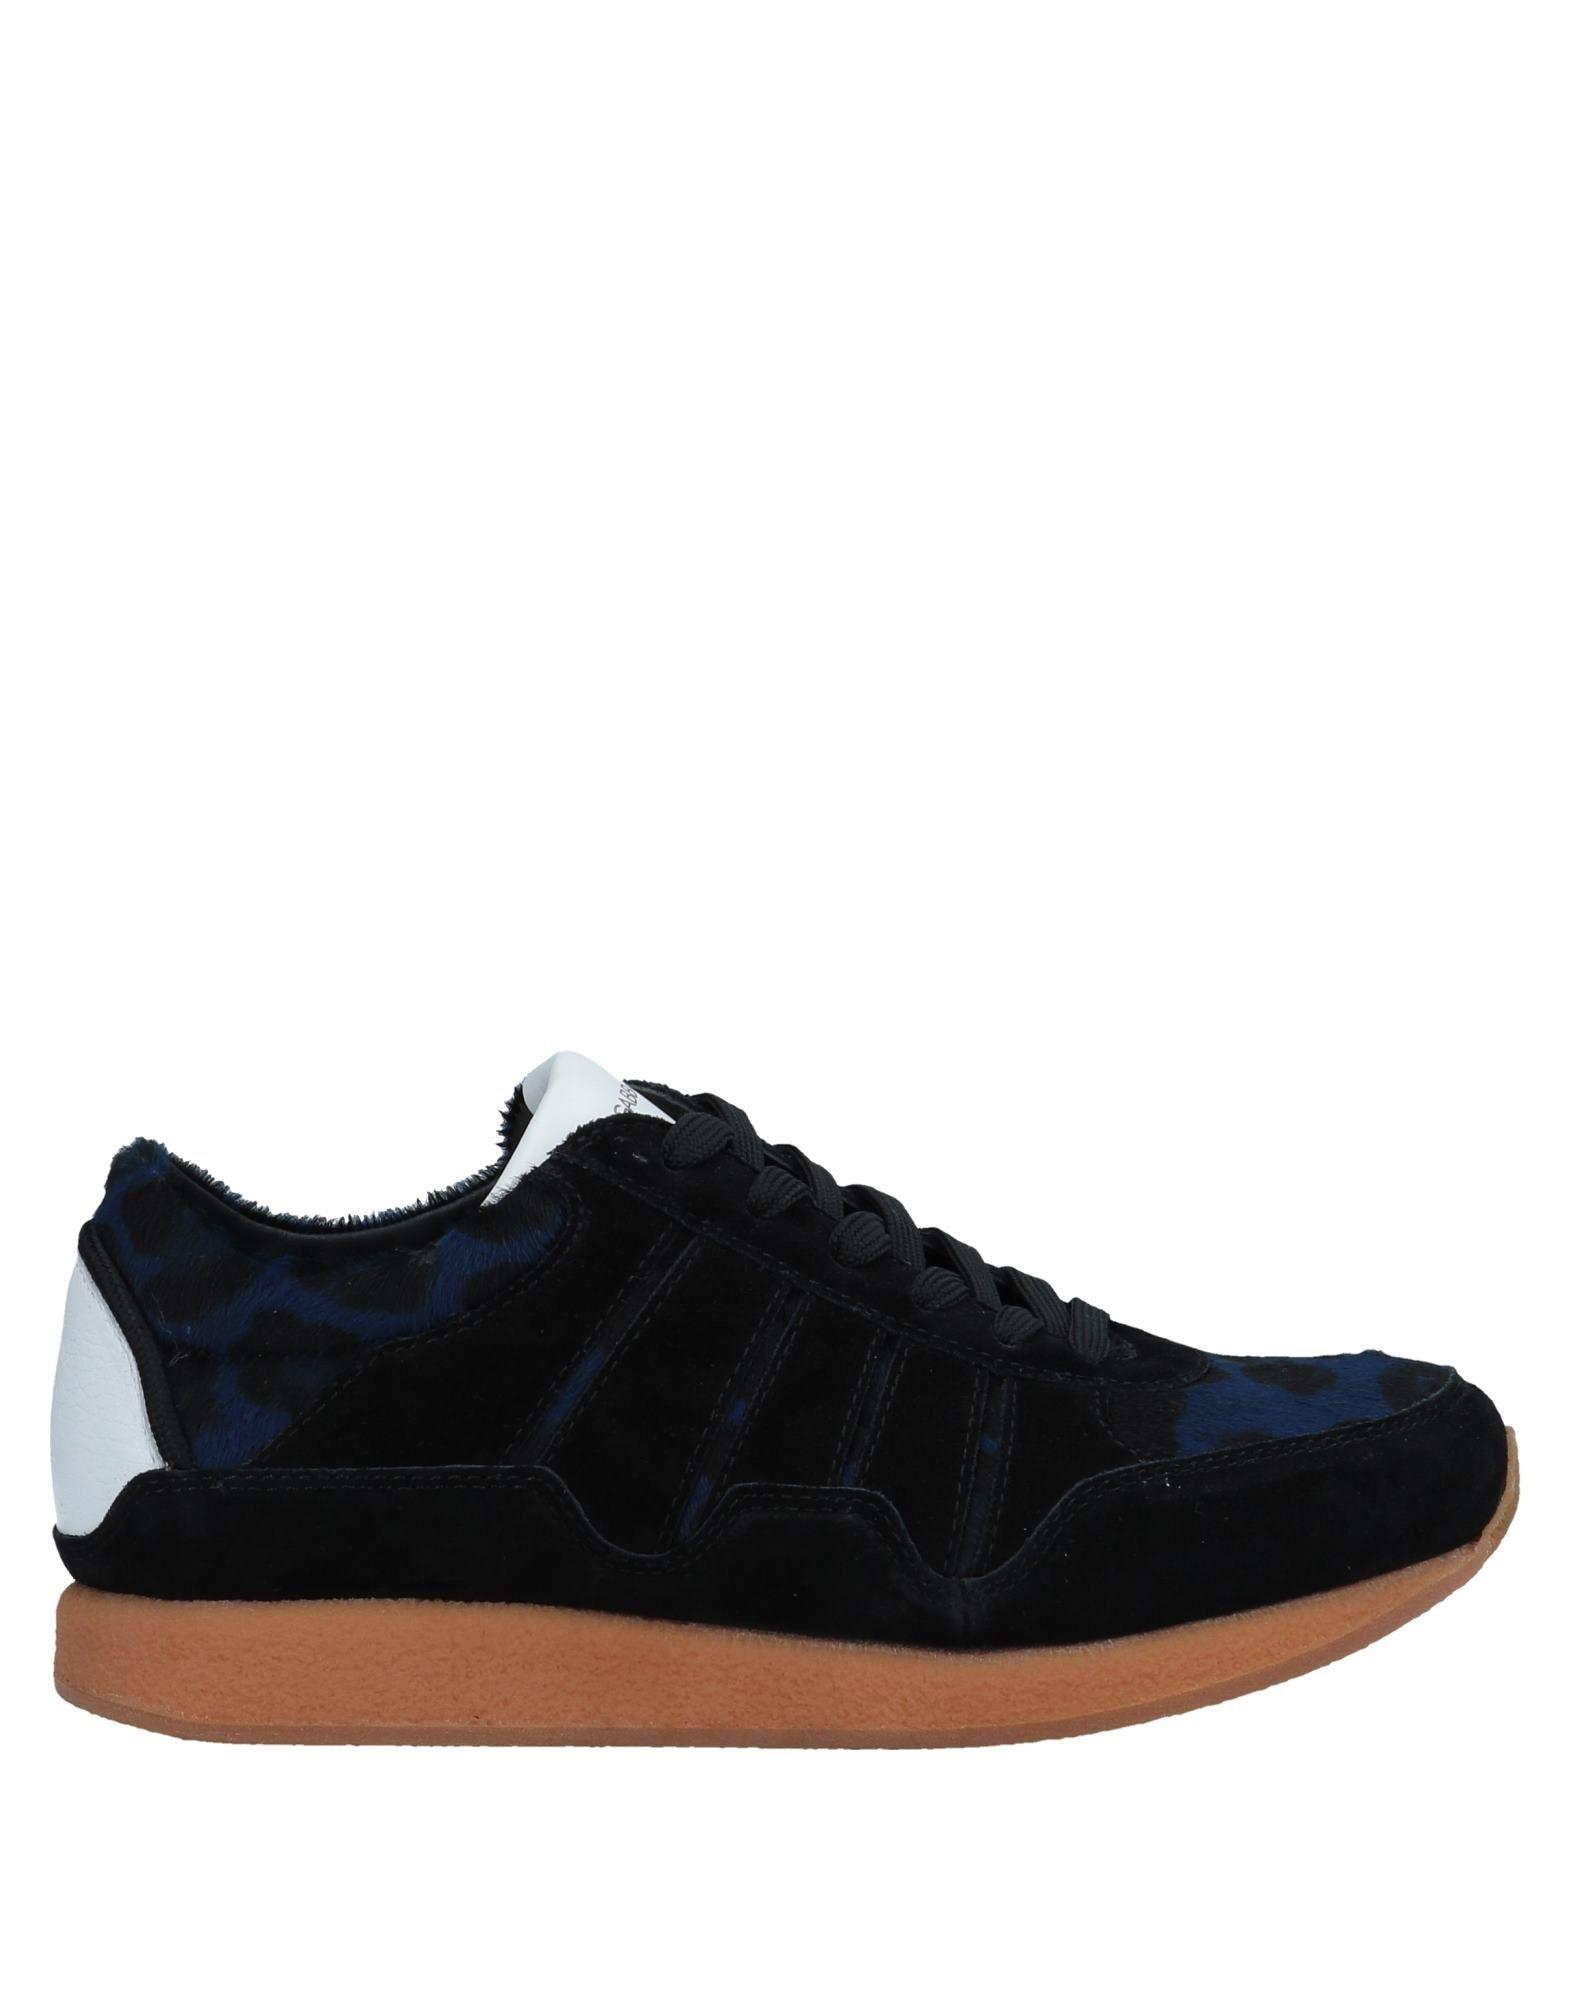 Dolce & Gabbana Sneakers Herren  11035221RL Gute Qualität beliebte Schuhe